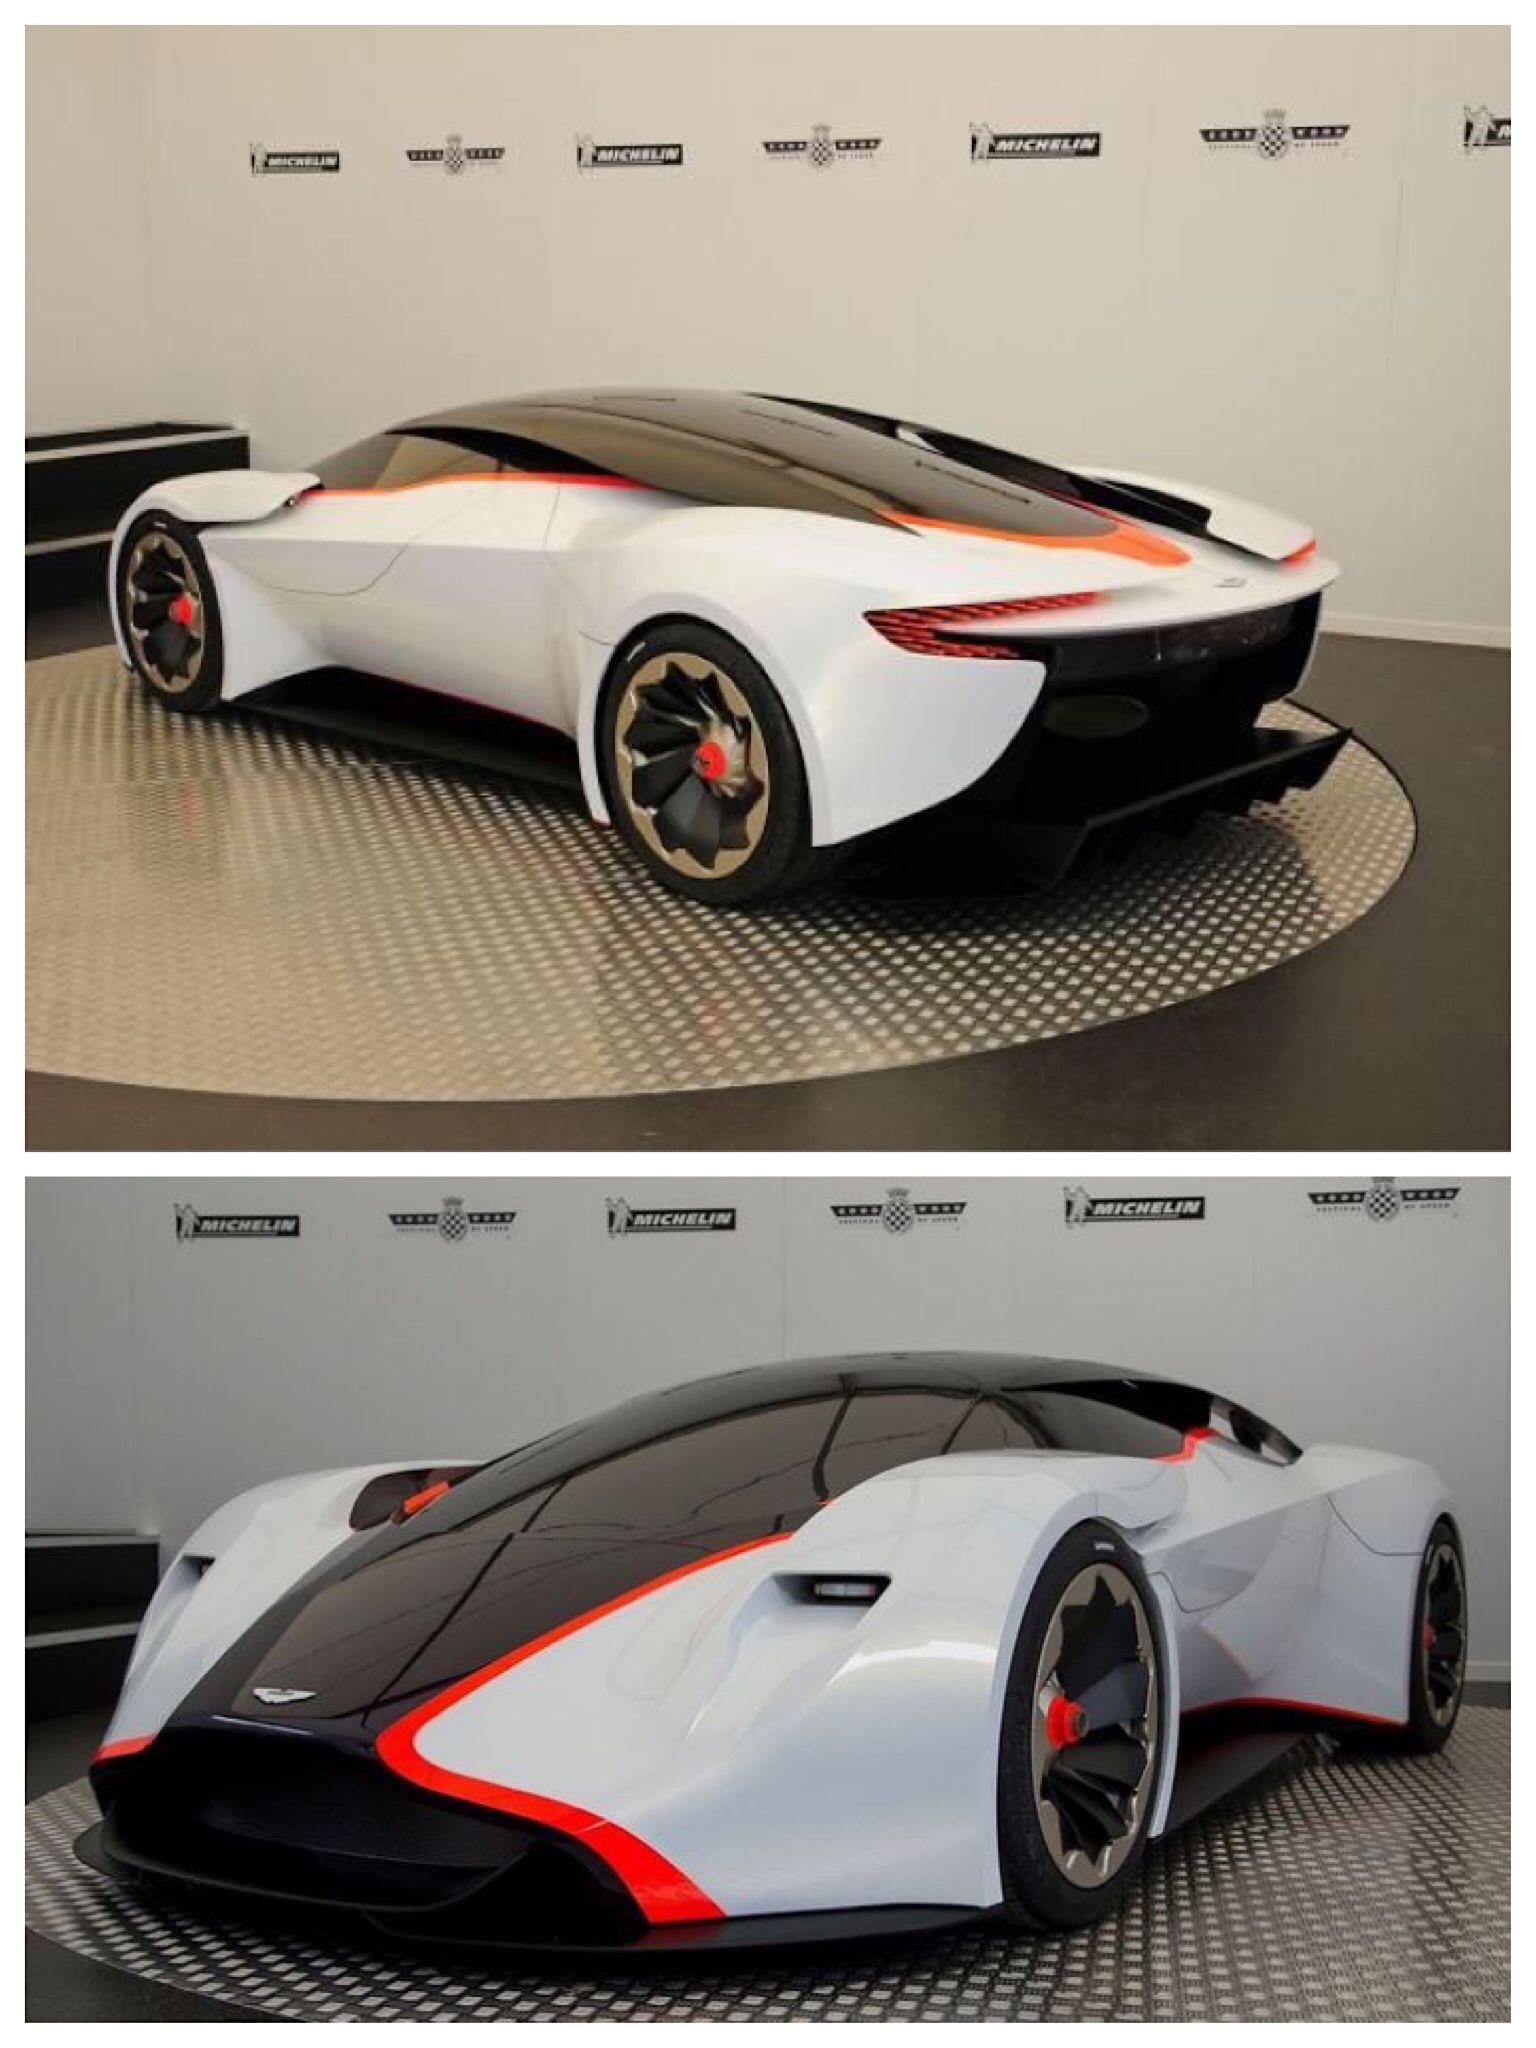 Supercars Pangels Best Mix Www Instagram Com Pangels Best Super Cars Best Sports Car